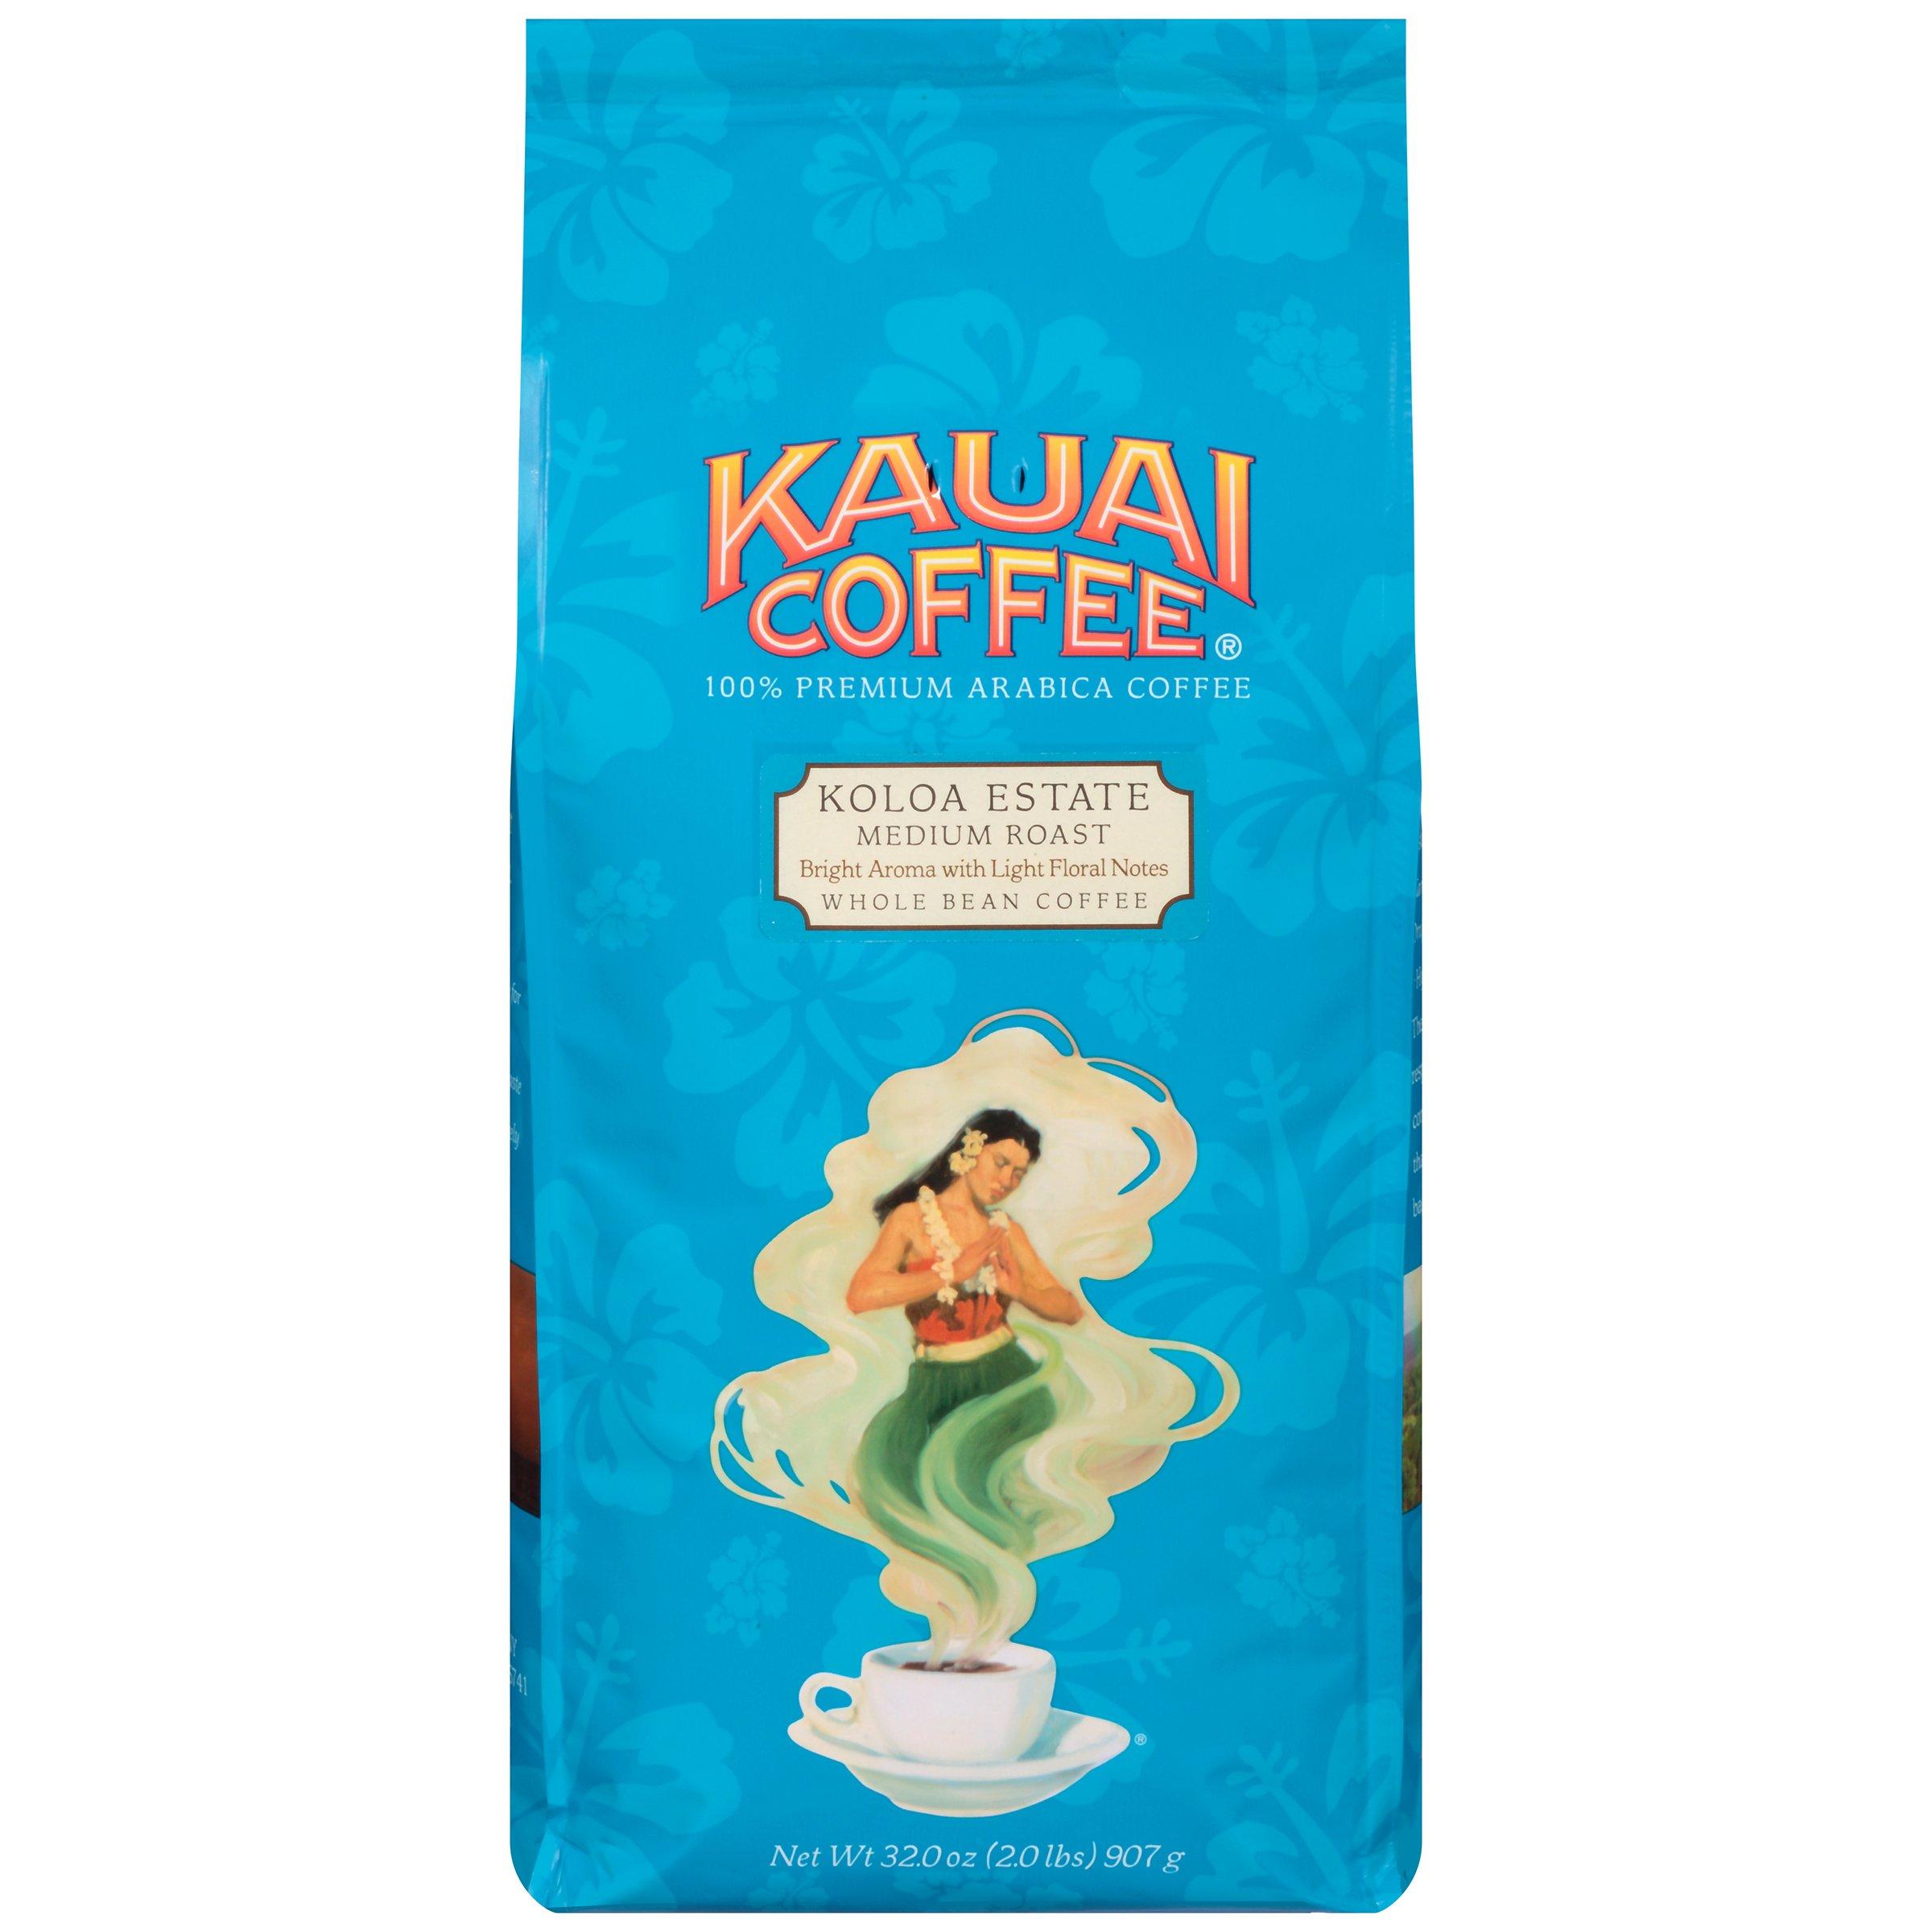 100% Kauai Whole Bean Coffee, Koloa Estate Medium Roast – 100% Premium Arabica Whole Bean Coffee from Hawaii's Largest Coffee Grower - Bright Aroma with Light Floral Notes (32 Ounces)